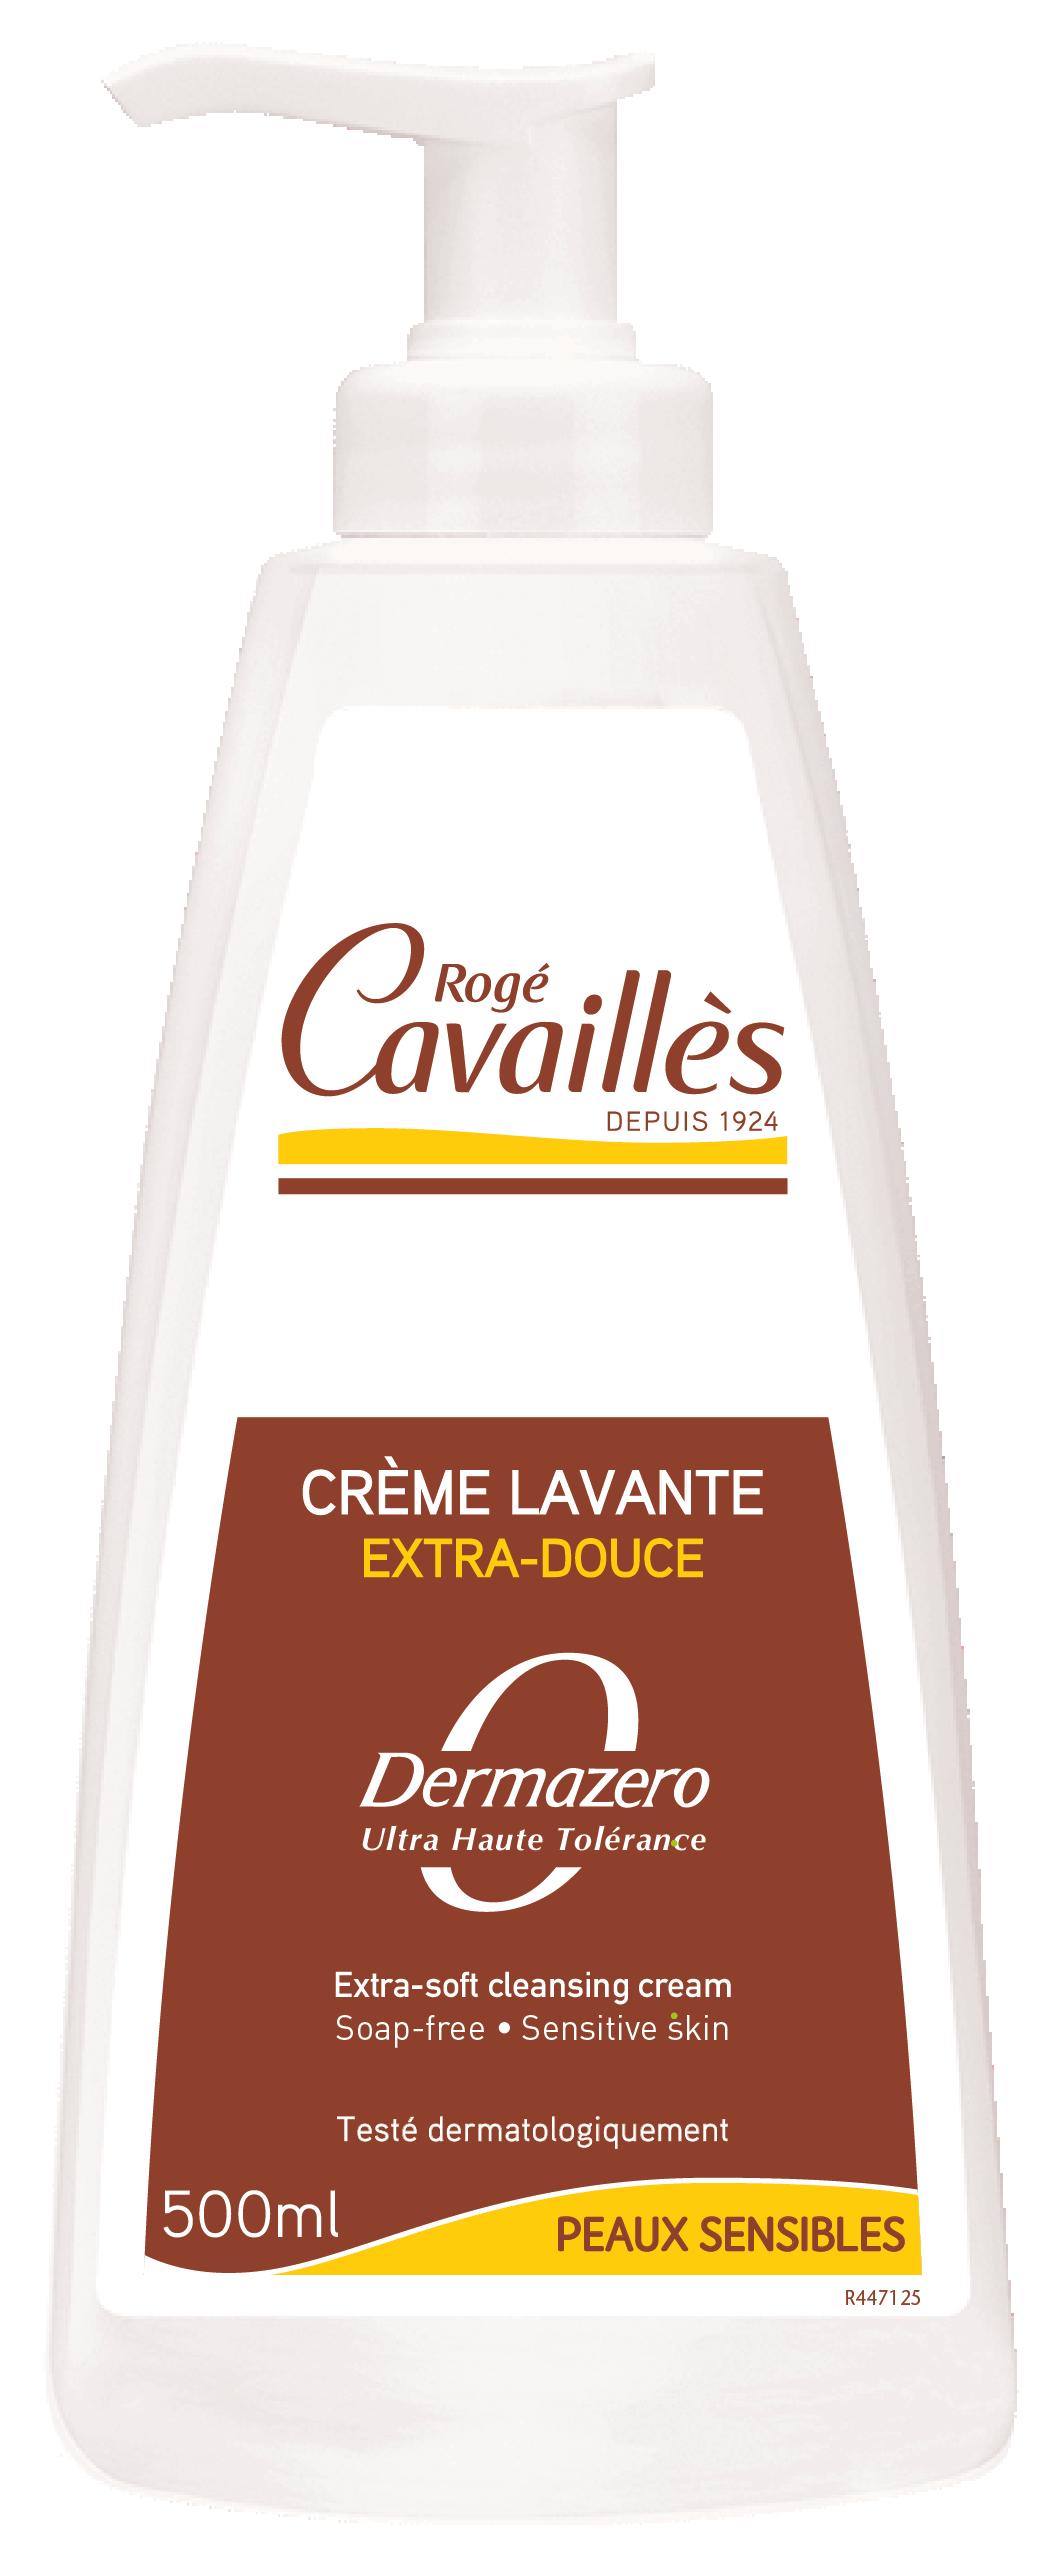 Creme Lavante Extra Douce 500 Ml